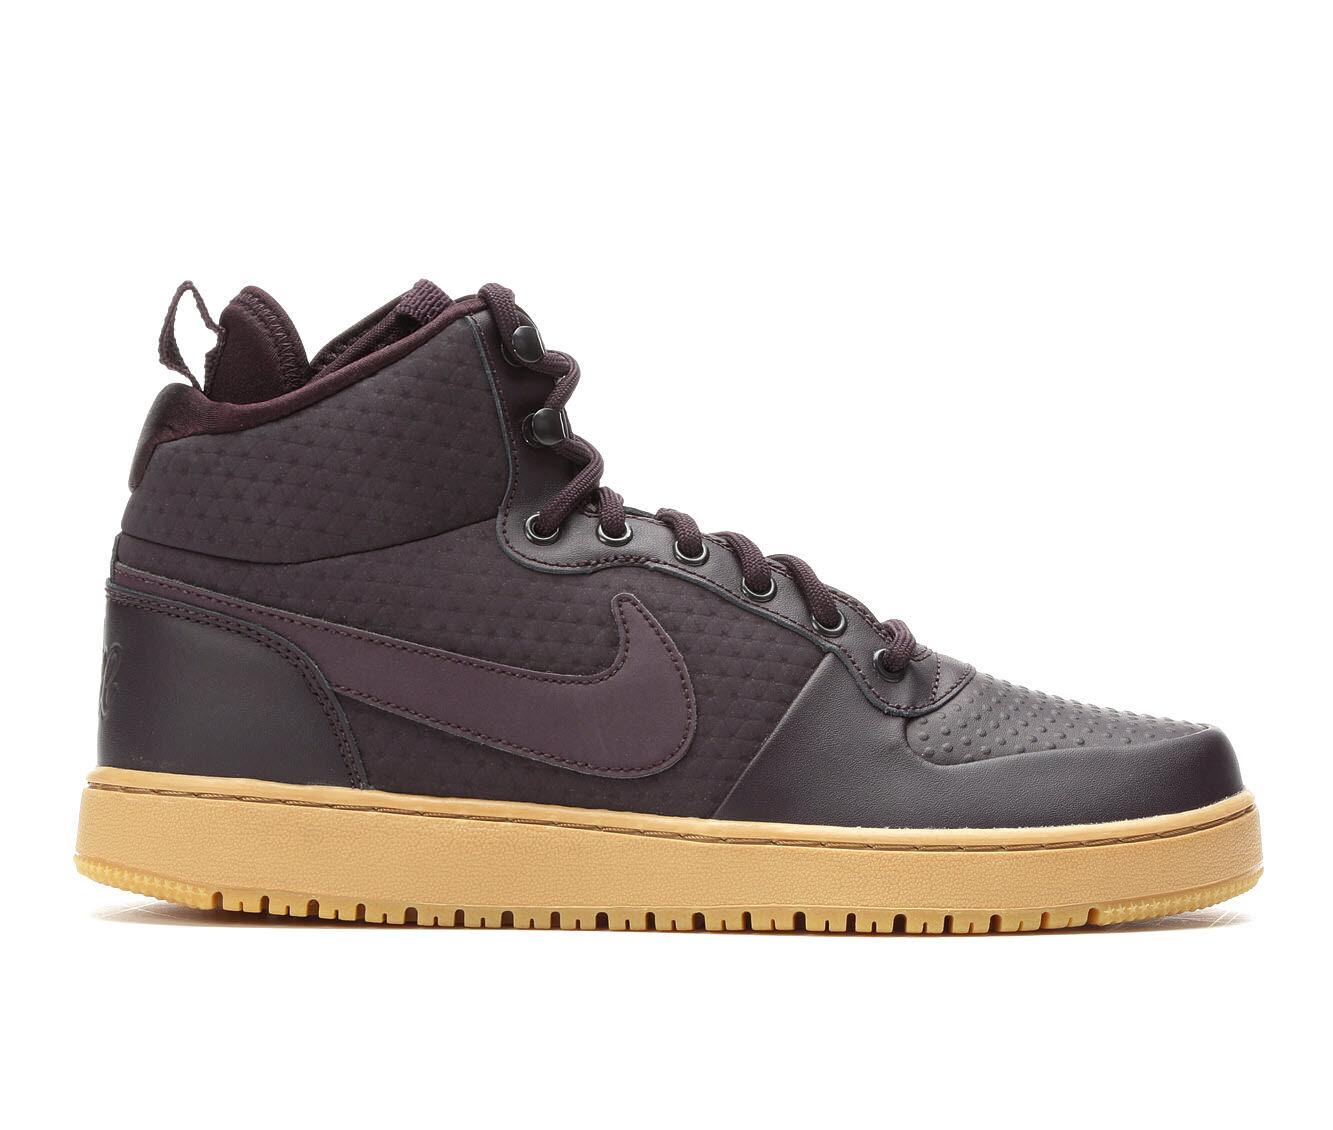 Men's Nike Ebernon Mid SE Sneakers Burg/Gum